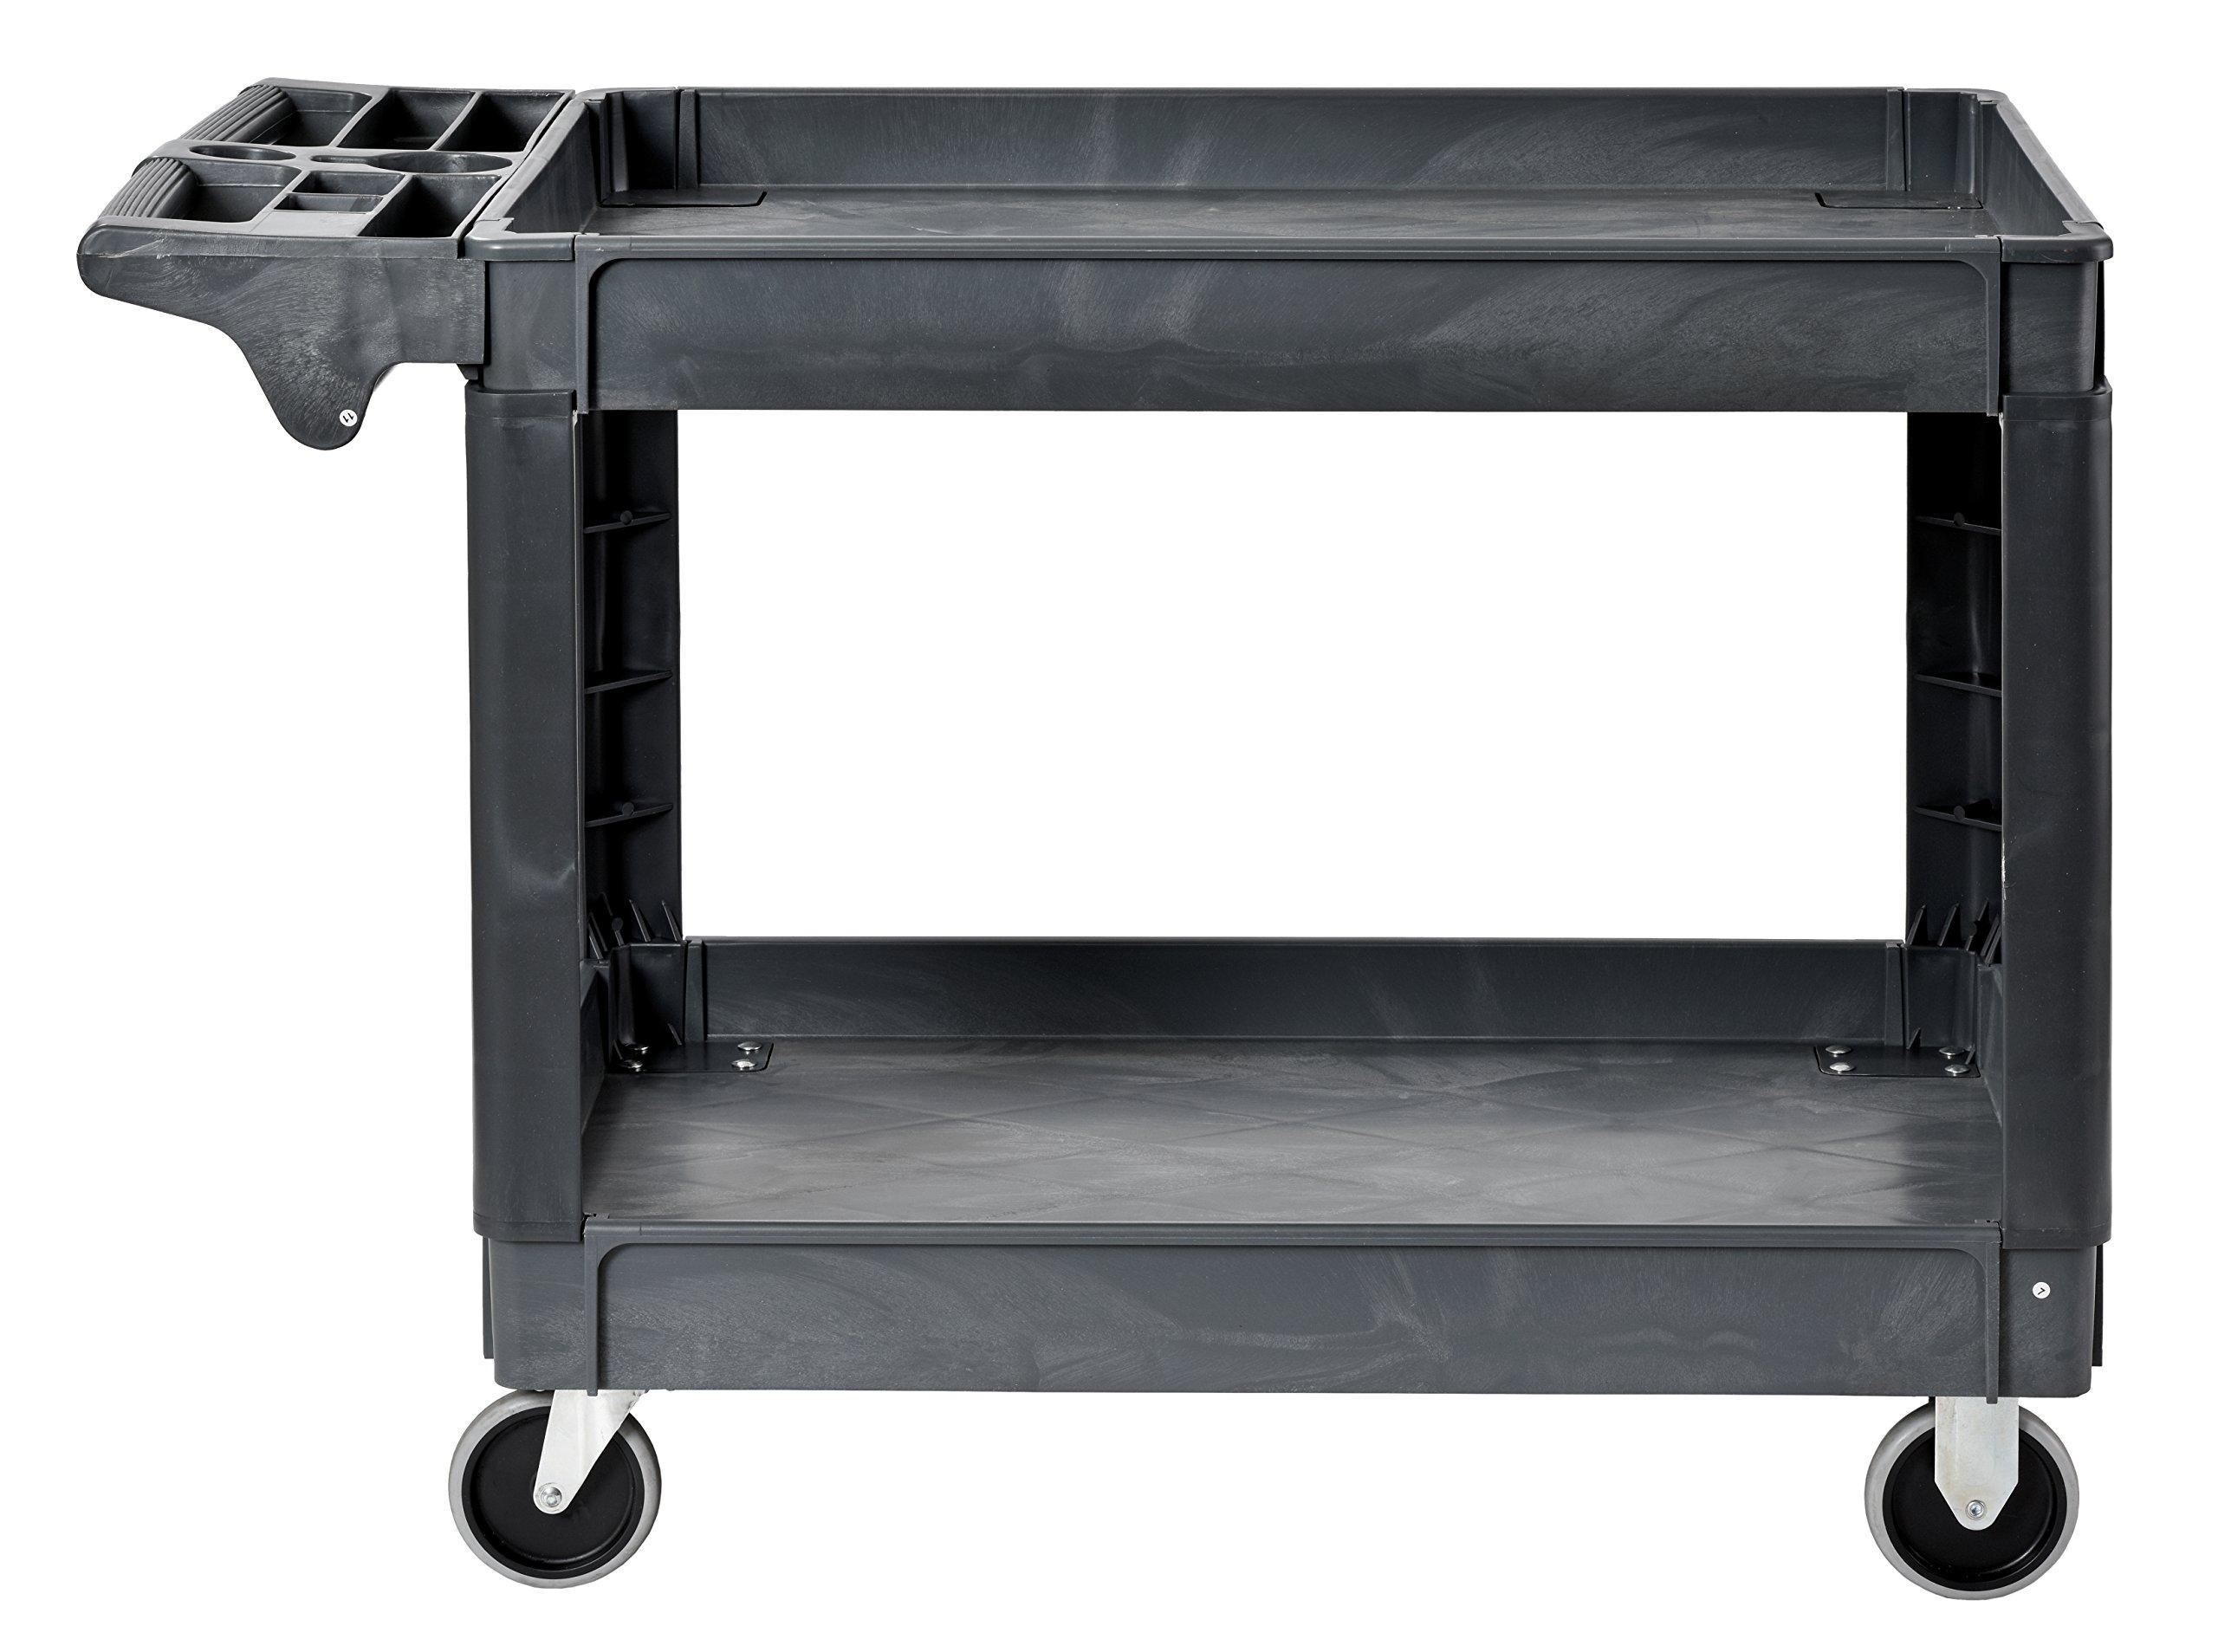 Sandusky PUC254635-2 Gray Heavy Duty Plastic Utility Cart, 2 Shelves, 33'' Width x 46'' Height x 25'' Depth